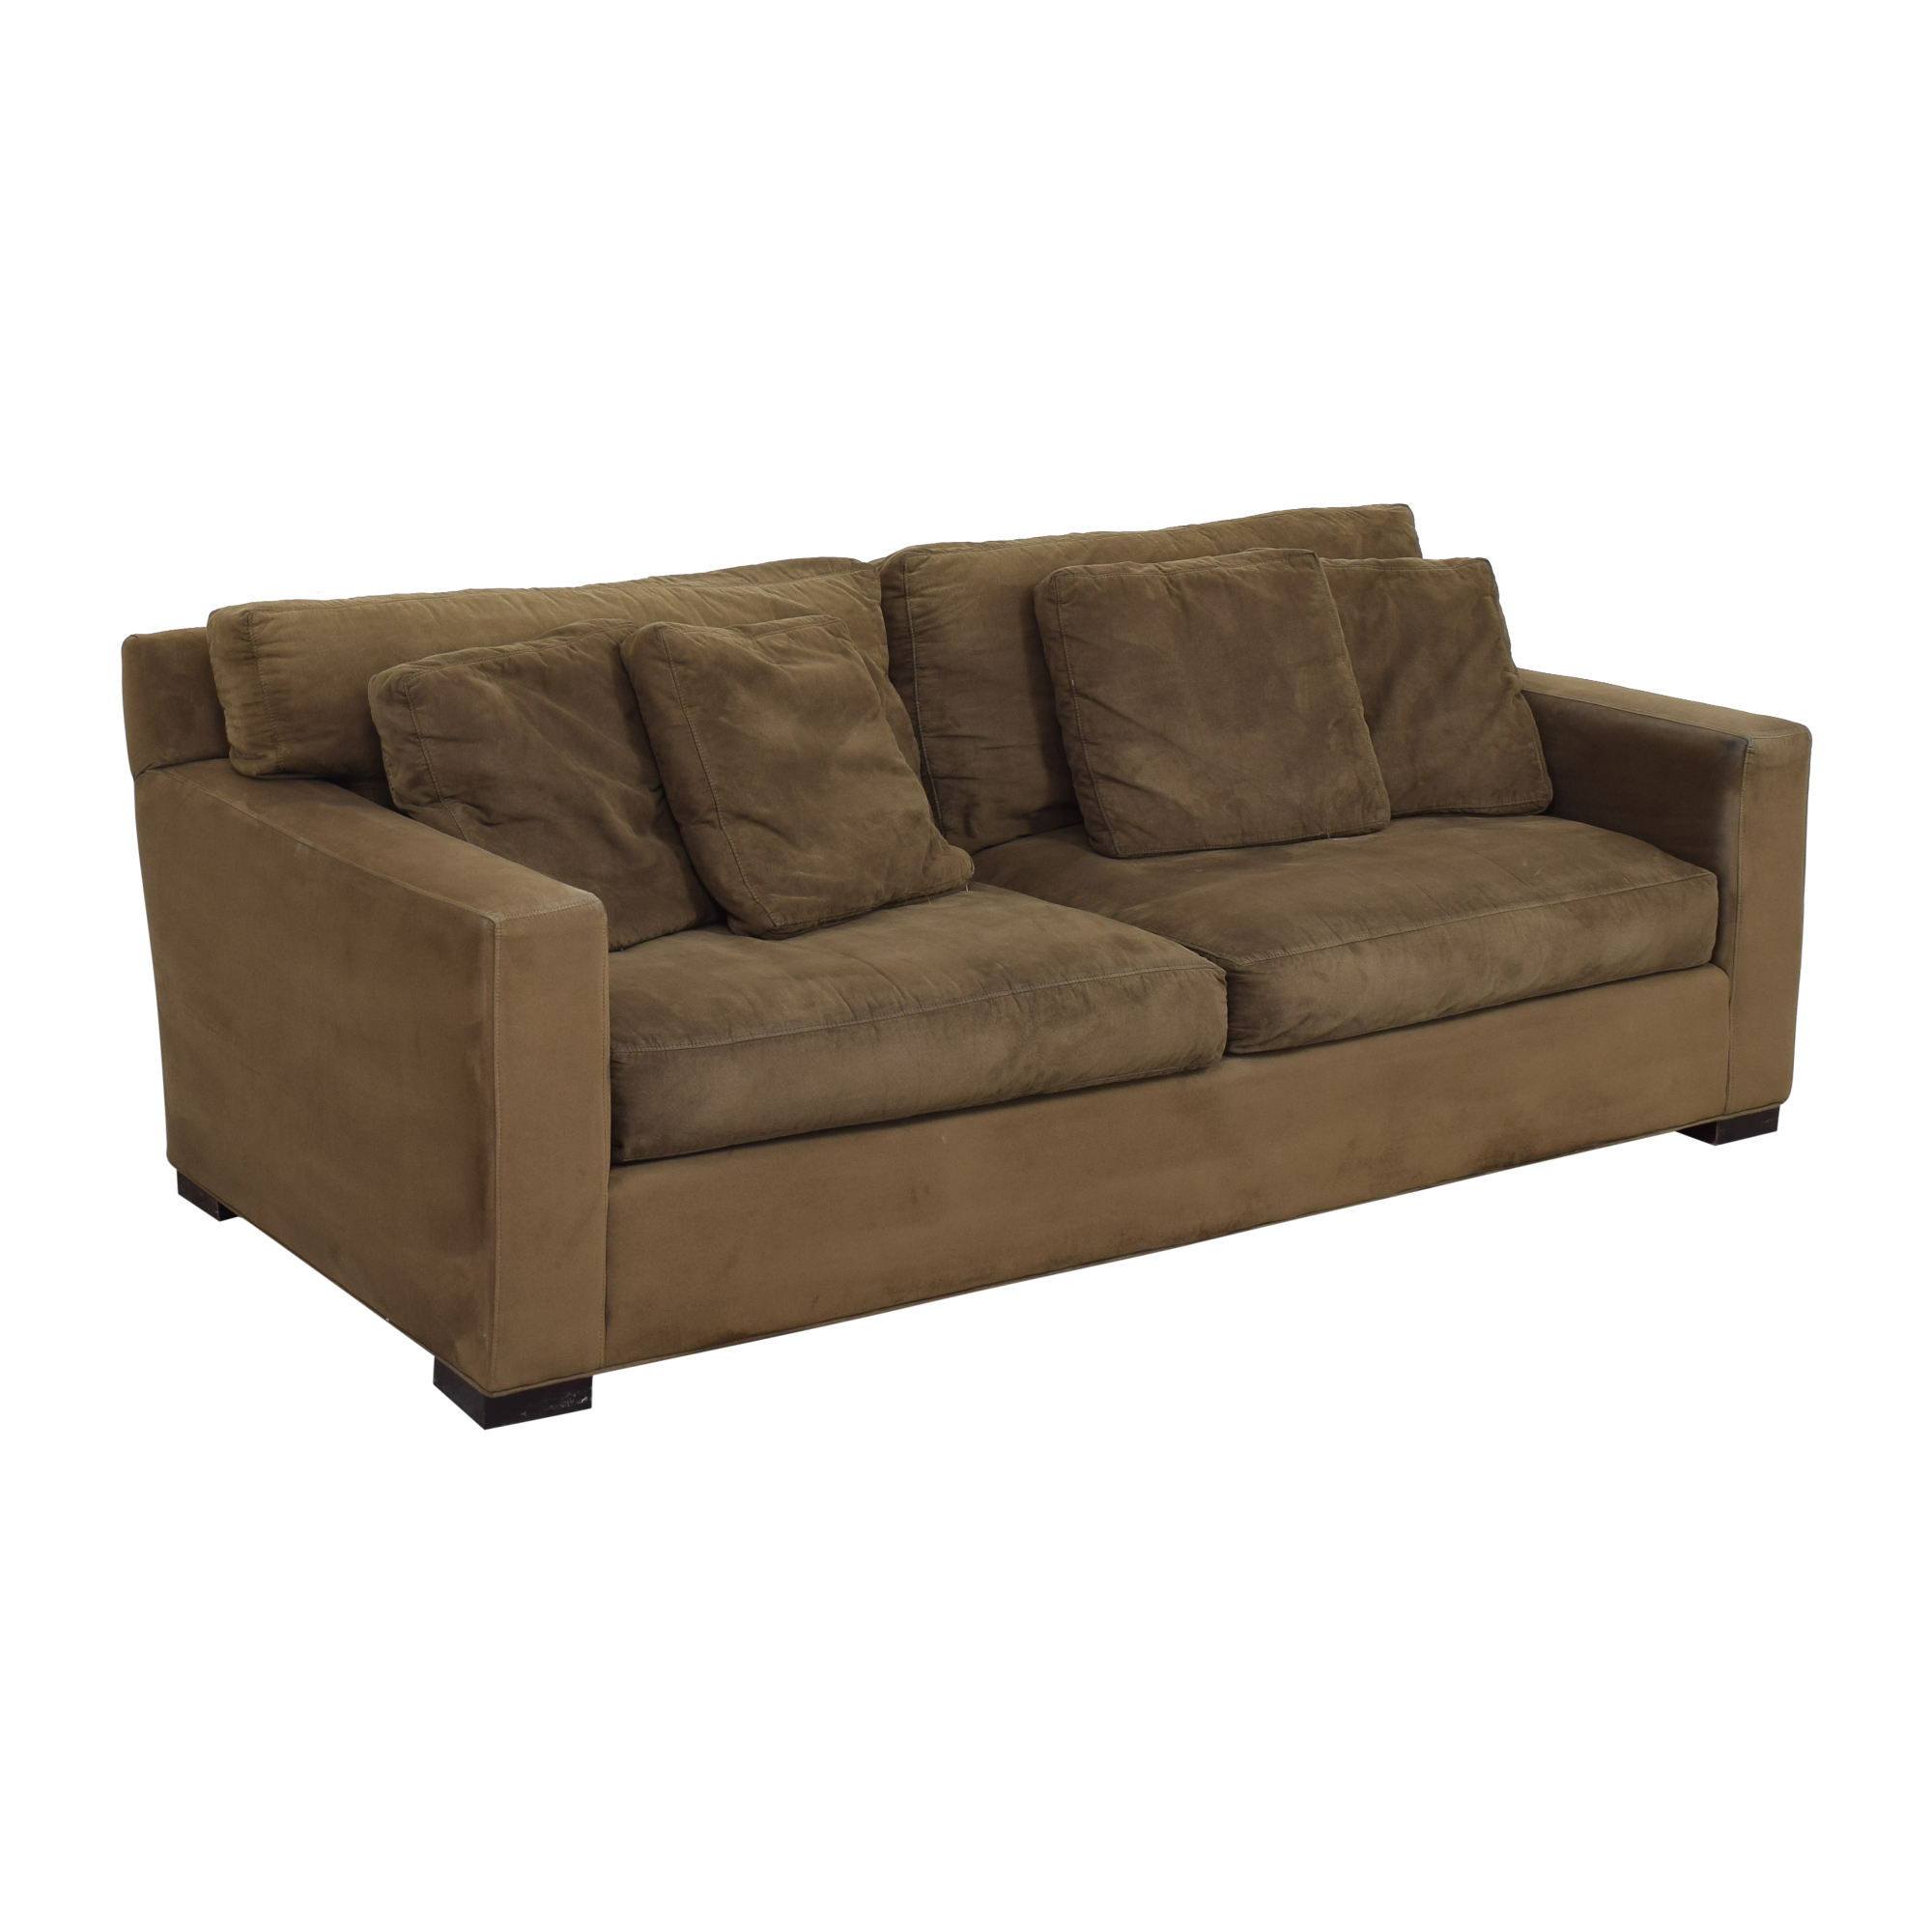 Crate & Barrel Crate & Barrel Axis II Two Cushion Sofa coupon